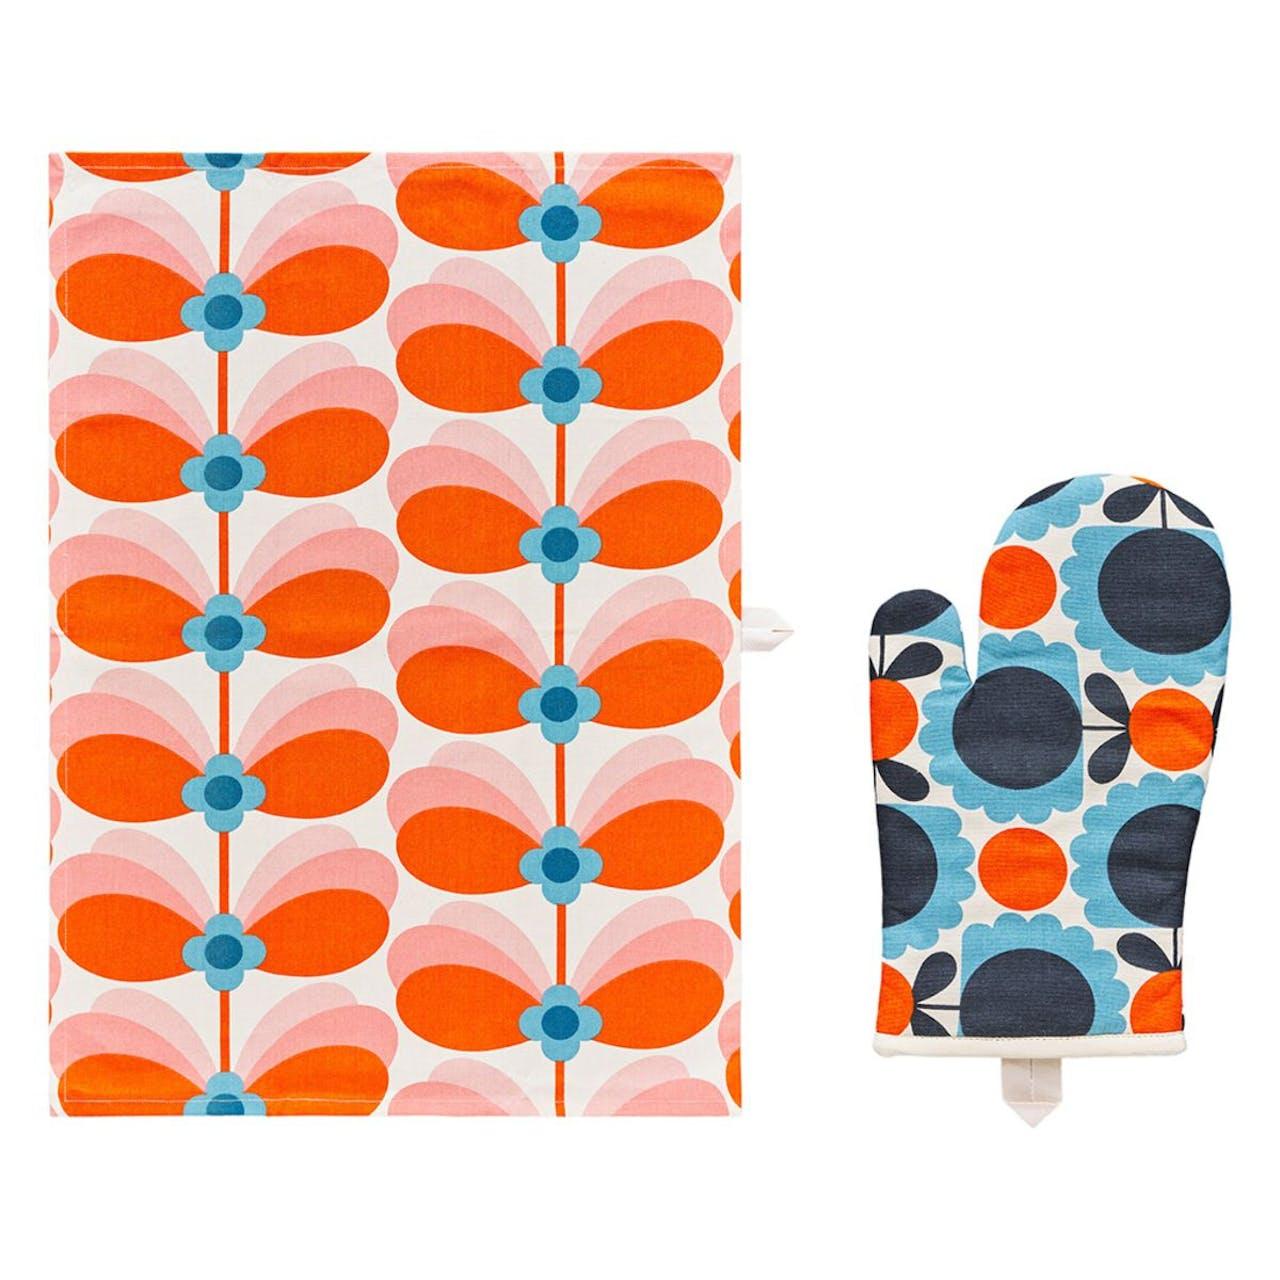 Orla Kiely Butterfly Stem Tea Towel and Oven Mitt Set